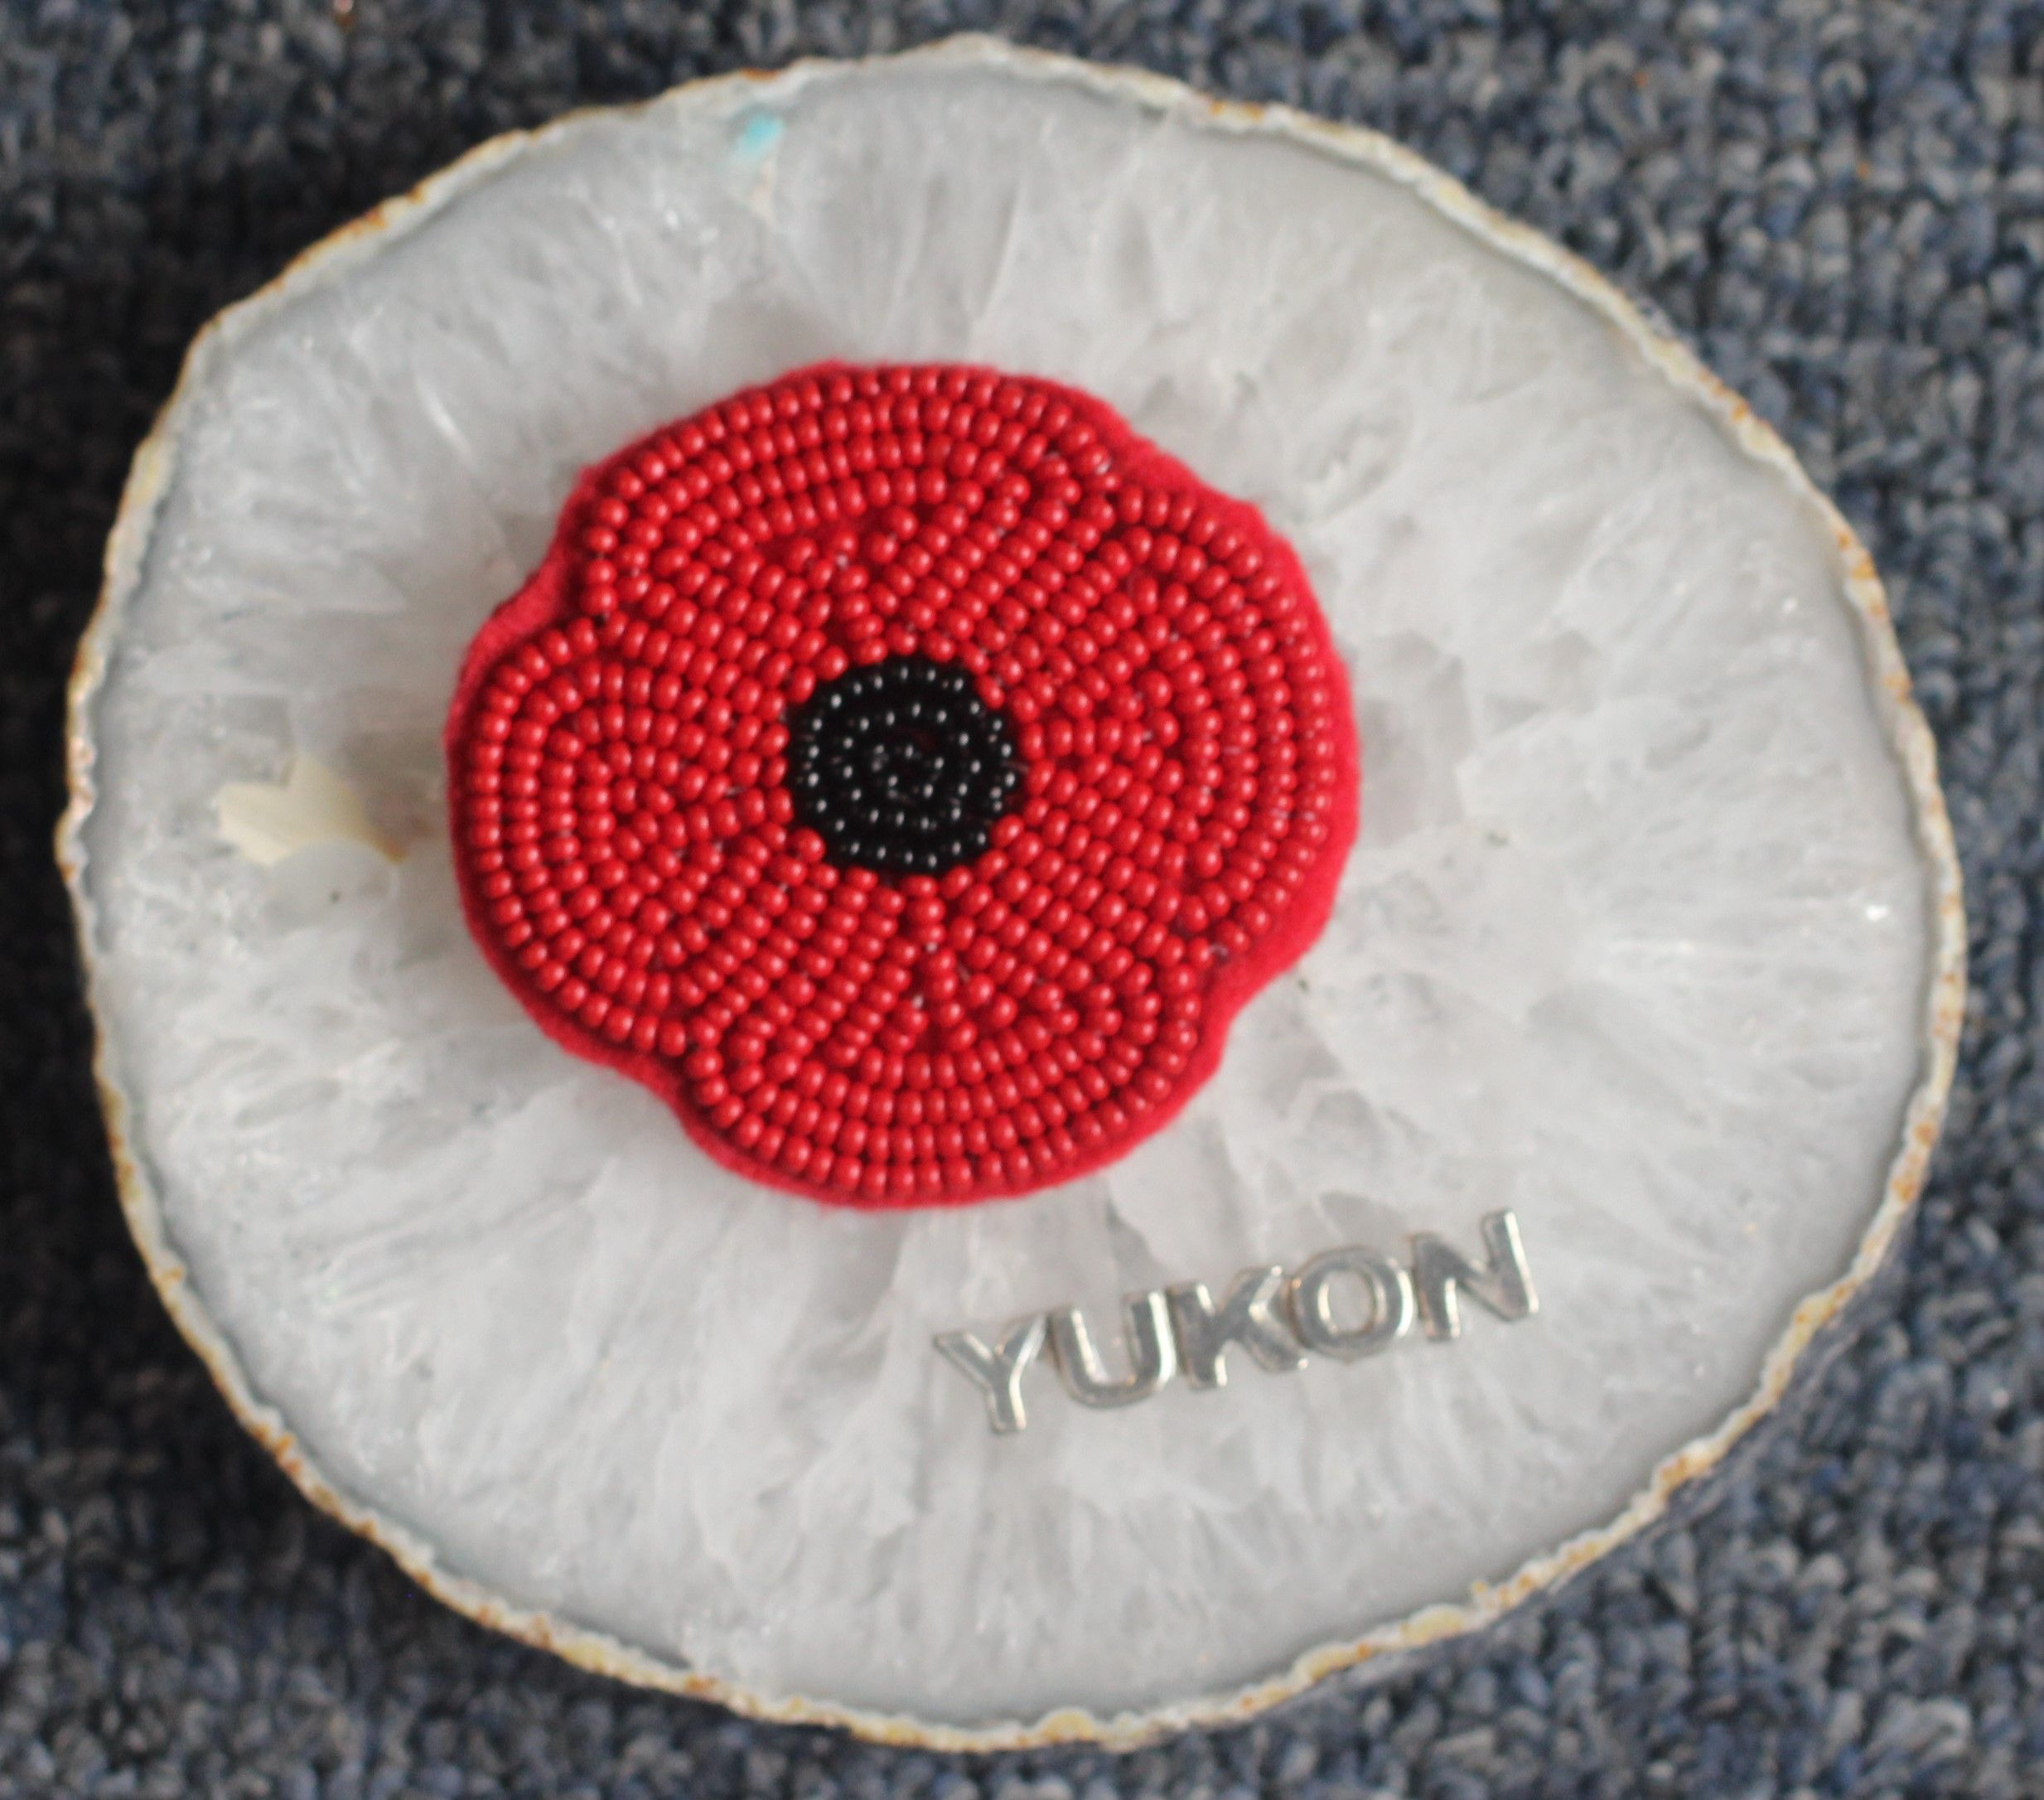 Beaded Poppy made by Suzanne Flumerfelt in Yukon, Canada